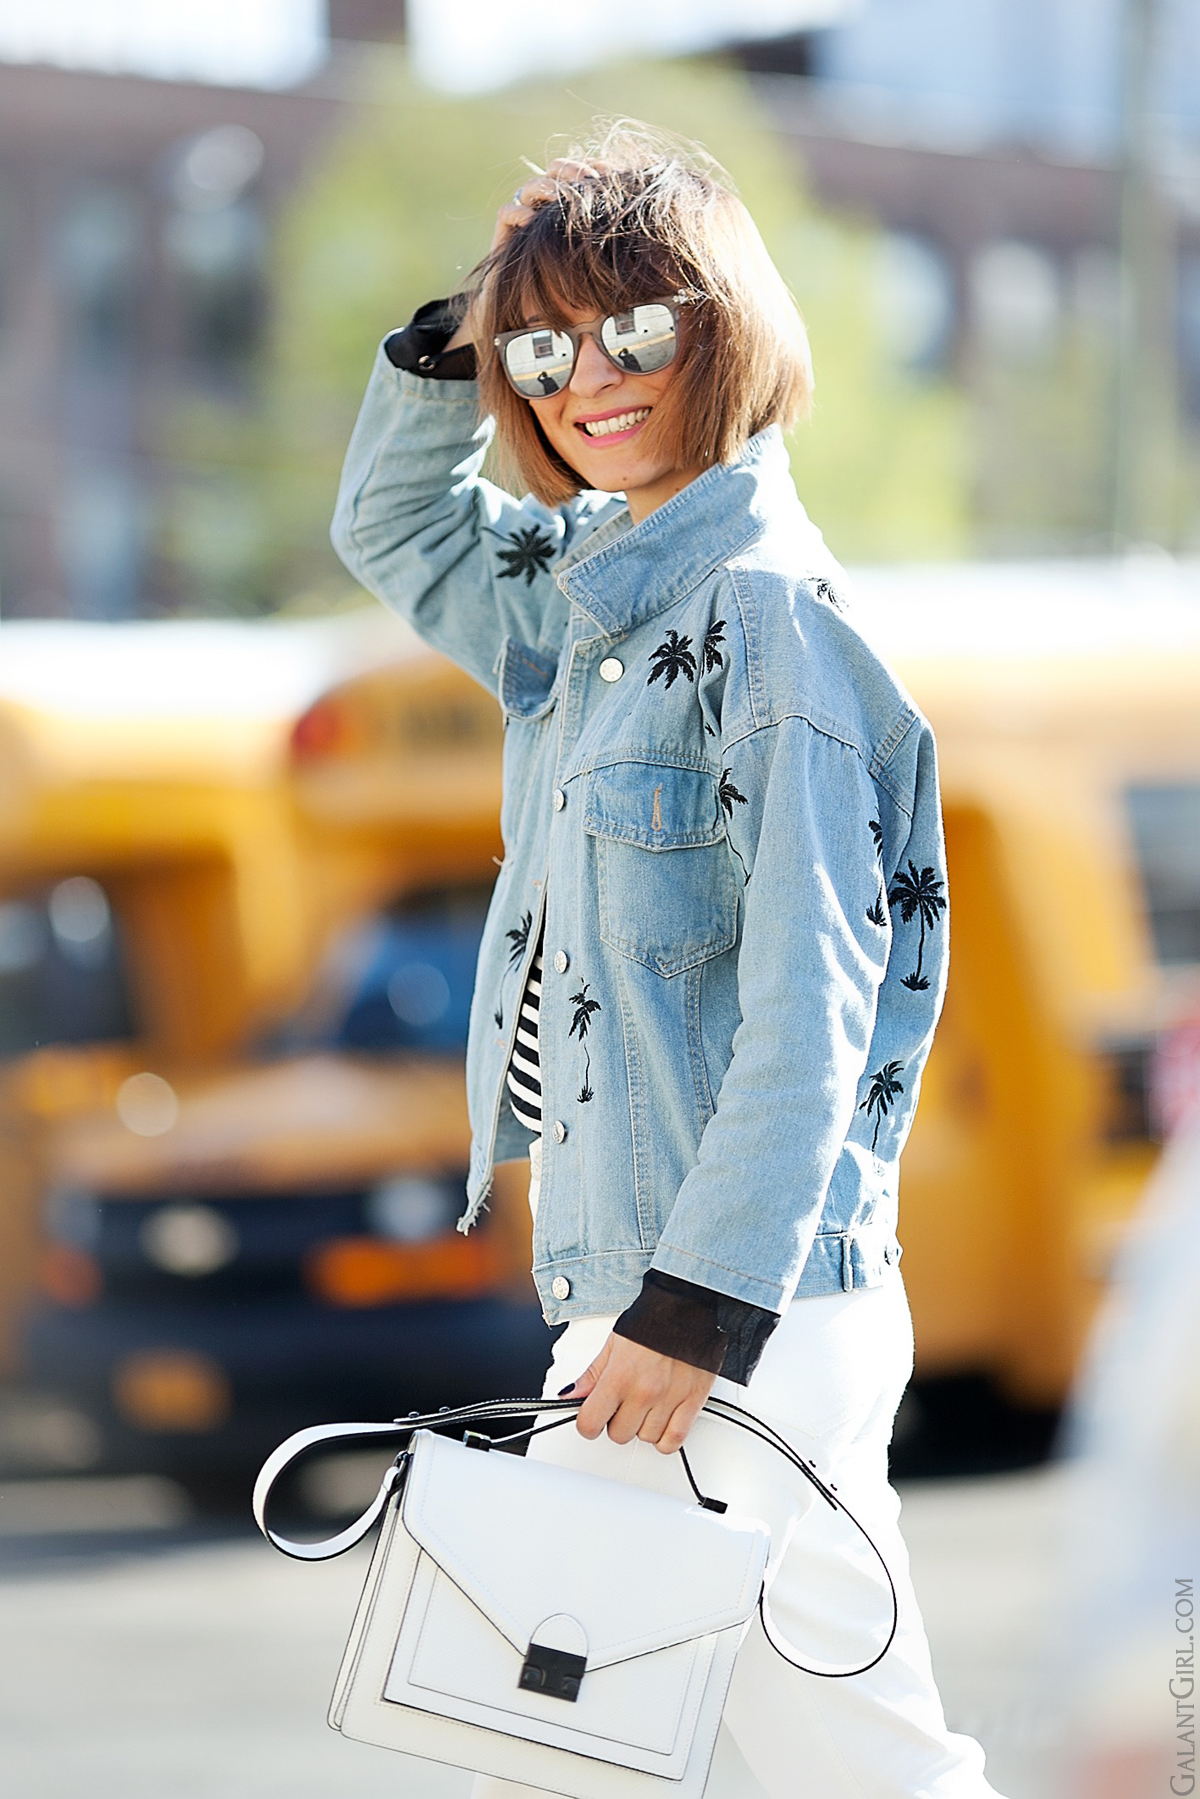 denim jacket, loeffler randall bag,  street style blog, street fashion, street style fashion, GalantGirl.com